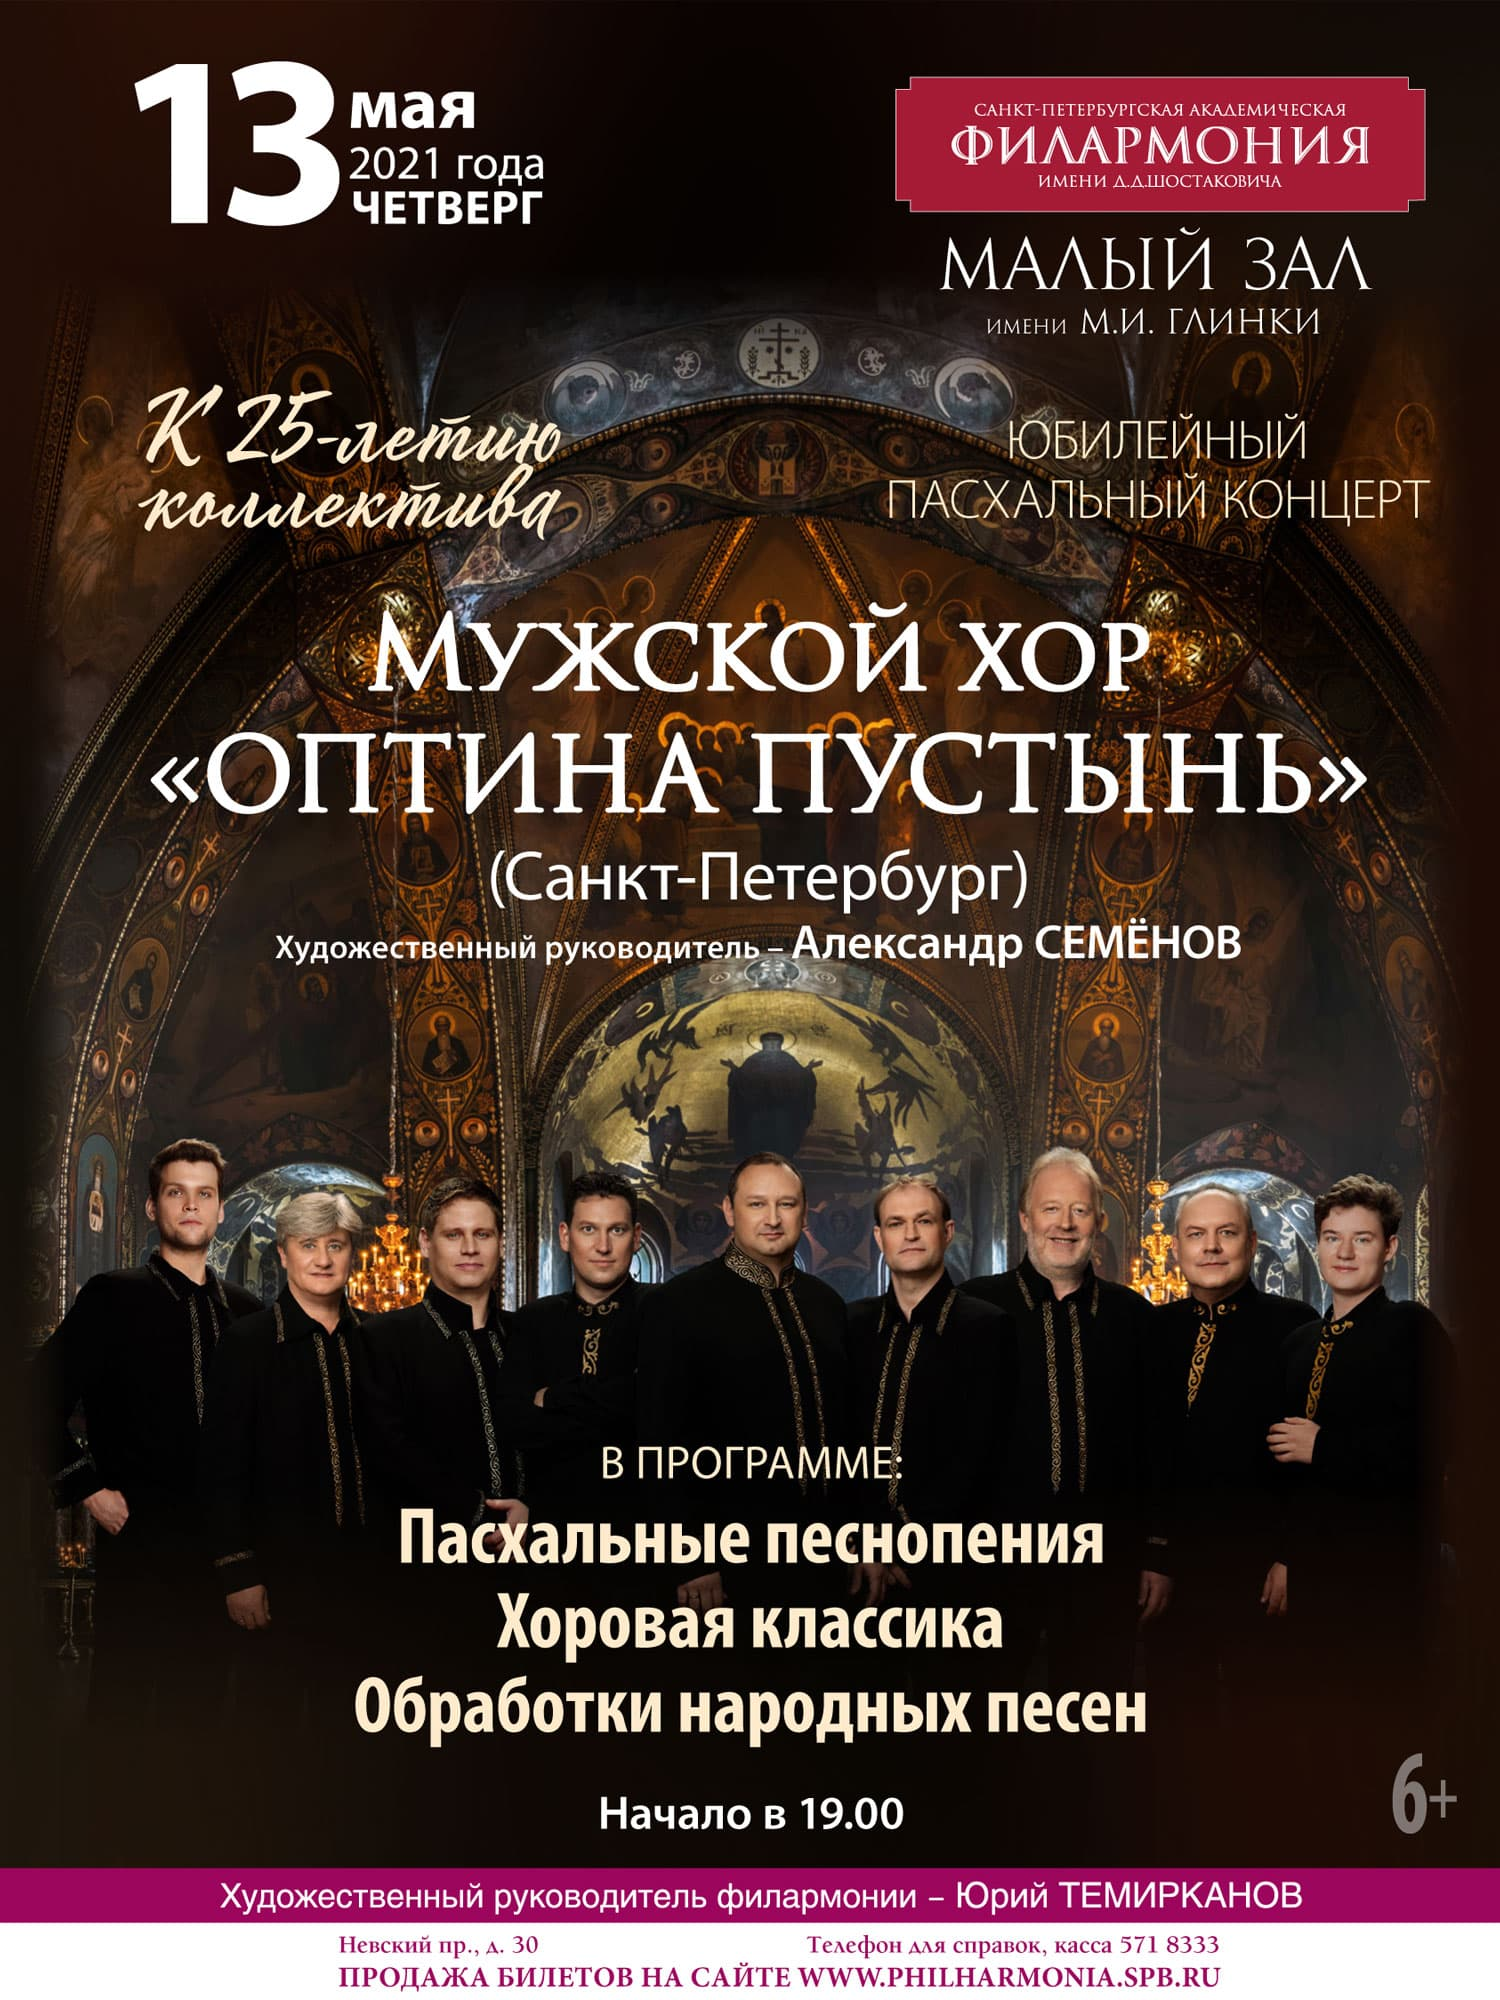 Optina Pustyn male choir. Saint-Petersburg Philharmonia